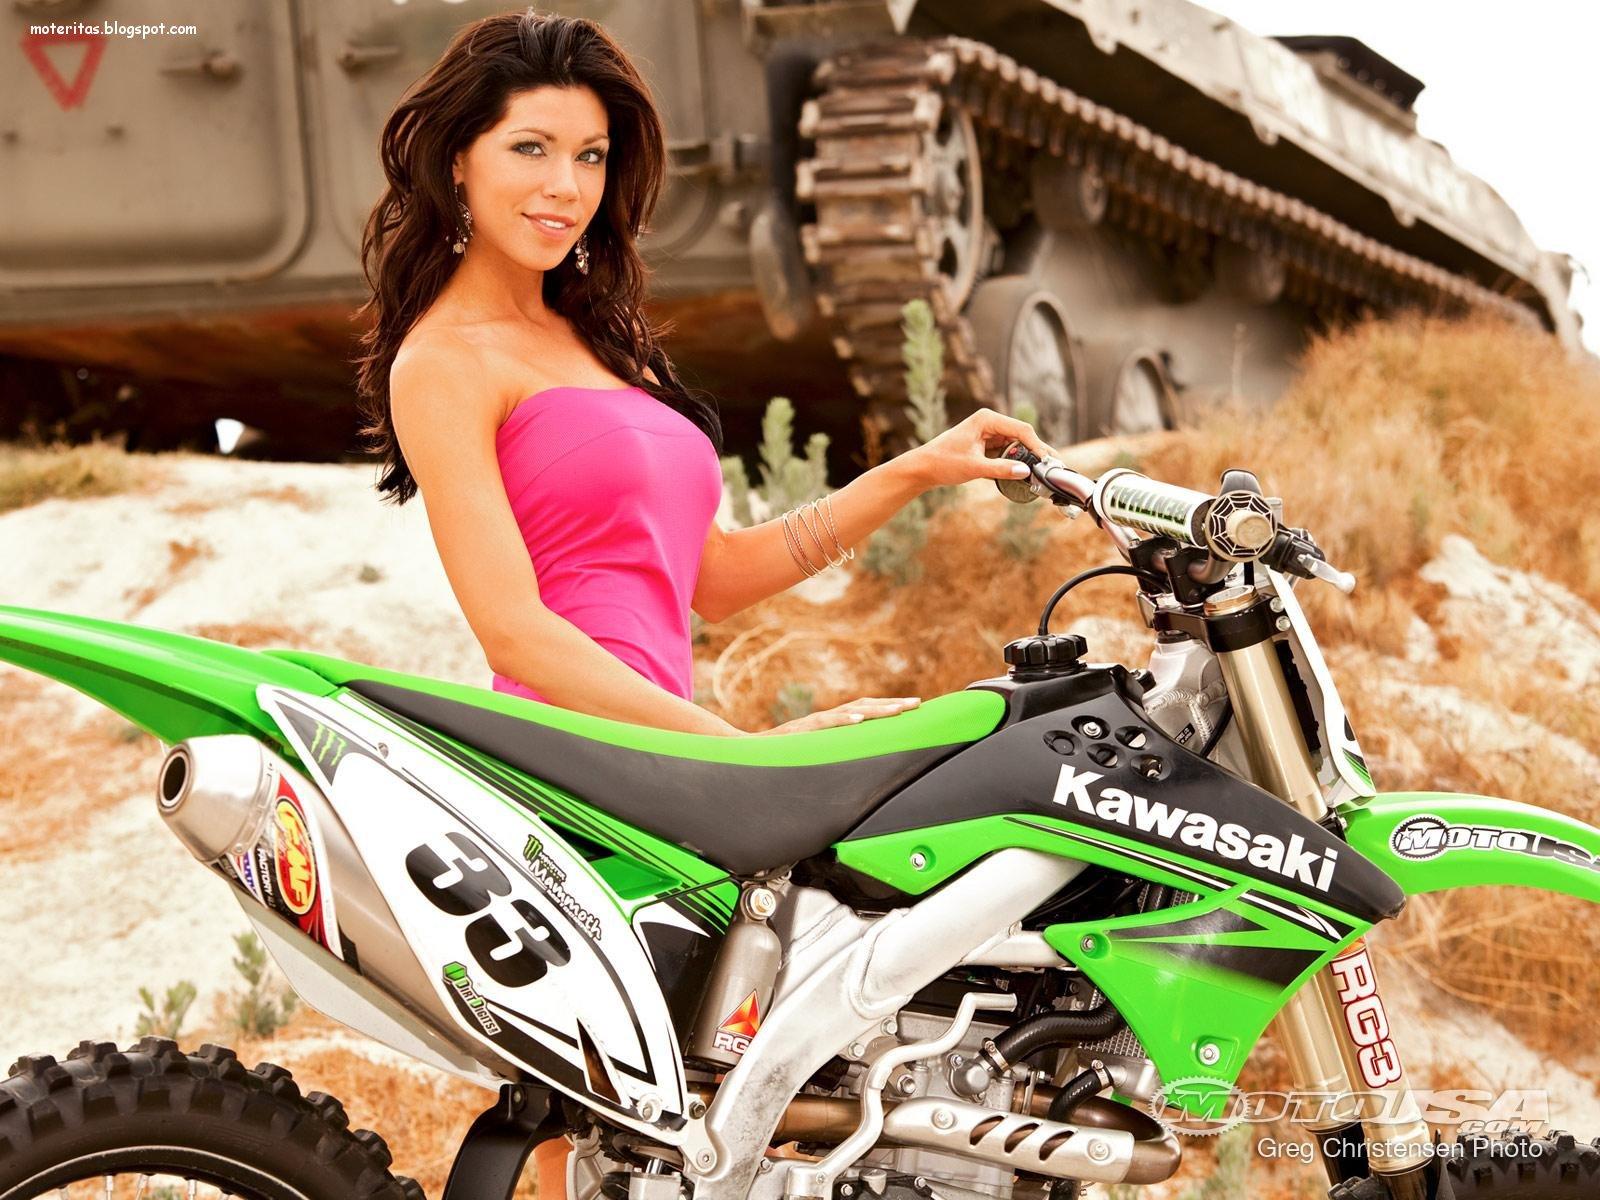 http://1.bp.blogspot.com/-fcs_z_ywfEk/UVBcrnwwTPI/AAAAAAAABXk/uPaC2wAWw3k/s1600/kawasaki-450-motocross-chica-mulheres-supercross-moto-fondo-hd-wallpaper-imagenes-mejores++%5Bmoteritas.blogspot.com%5D.jpg